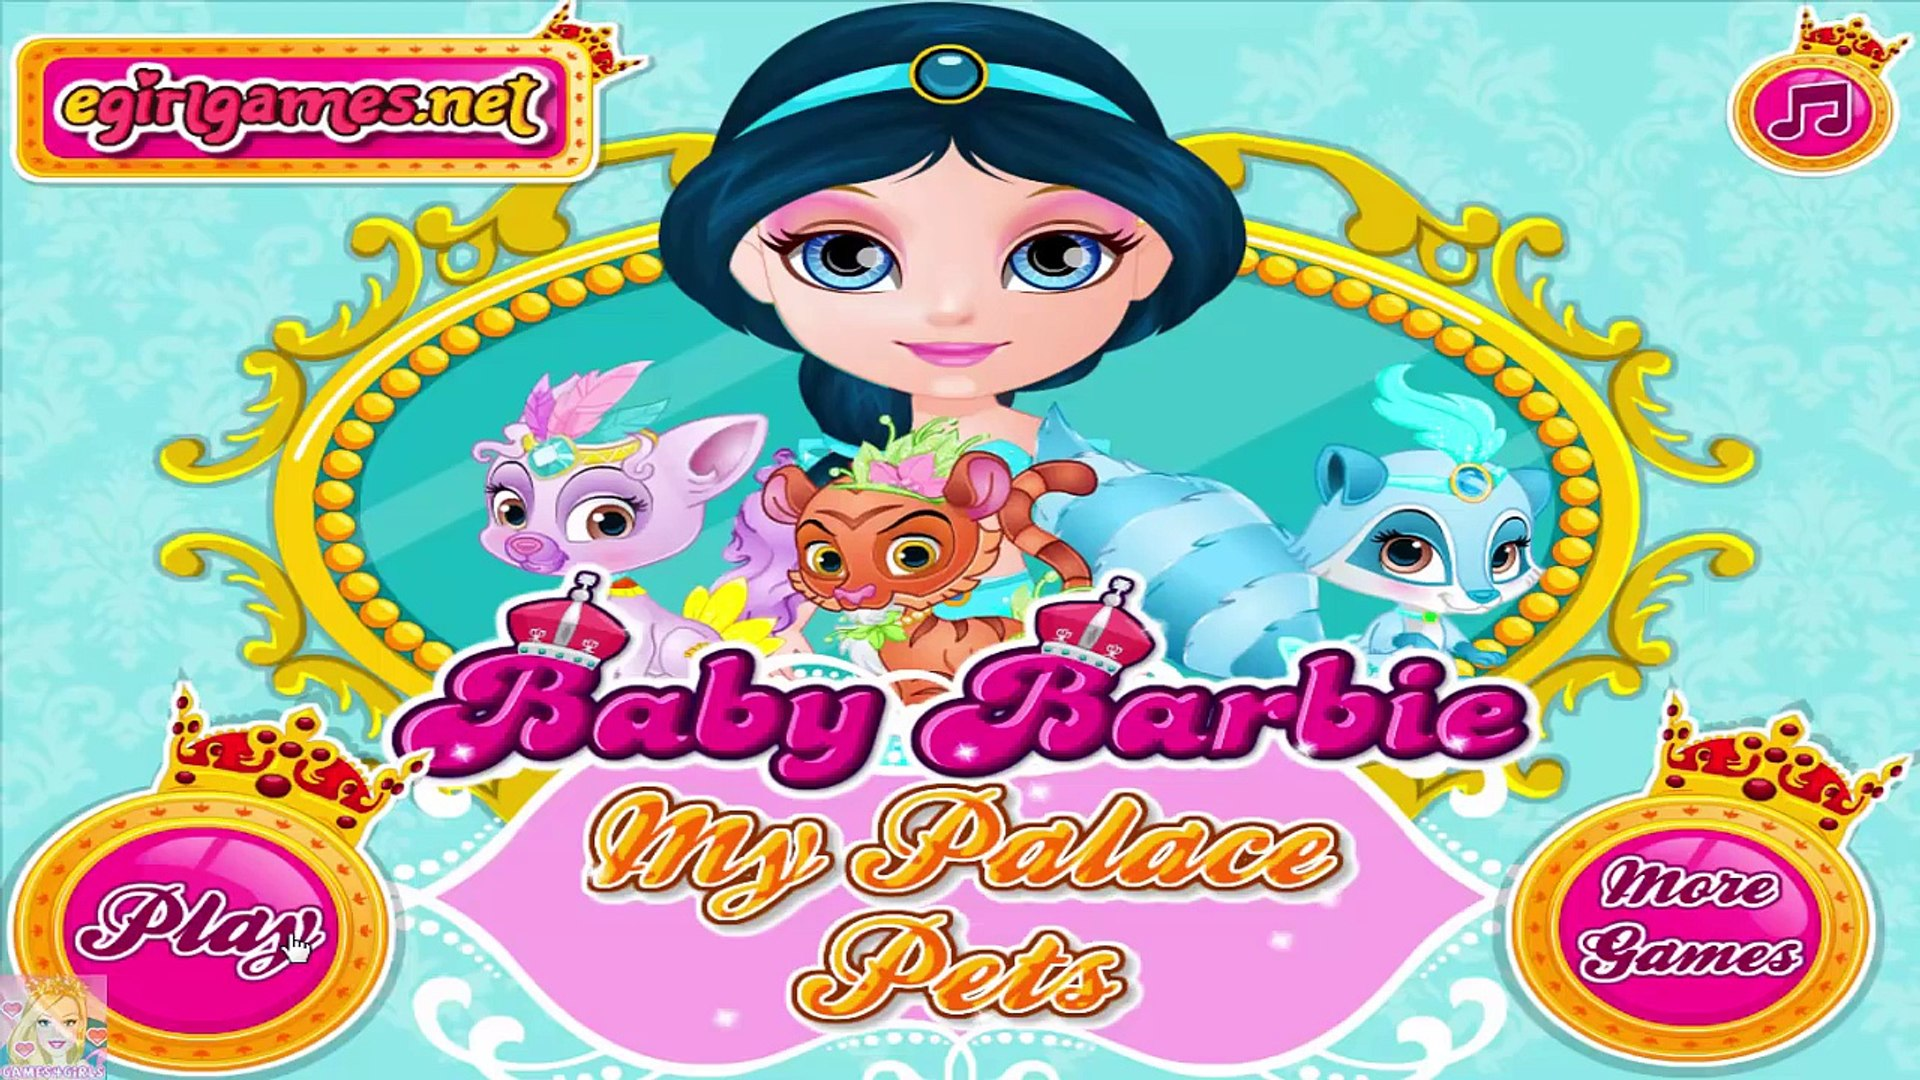 Baby Barbie My Palace Pets - Princess Barbie Palace Pets Care Game for Kids